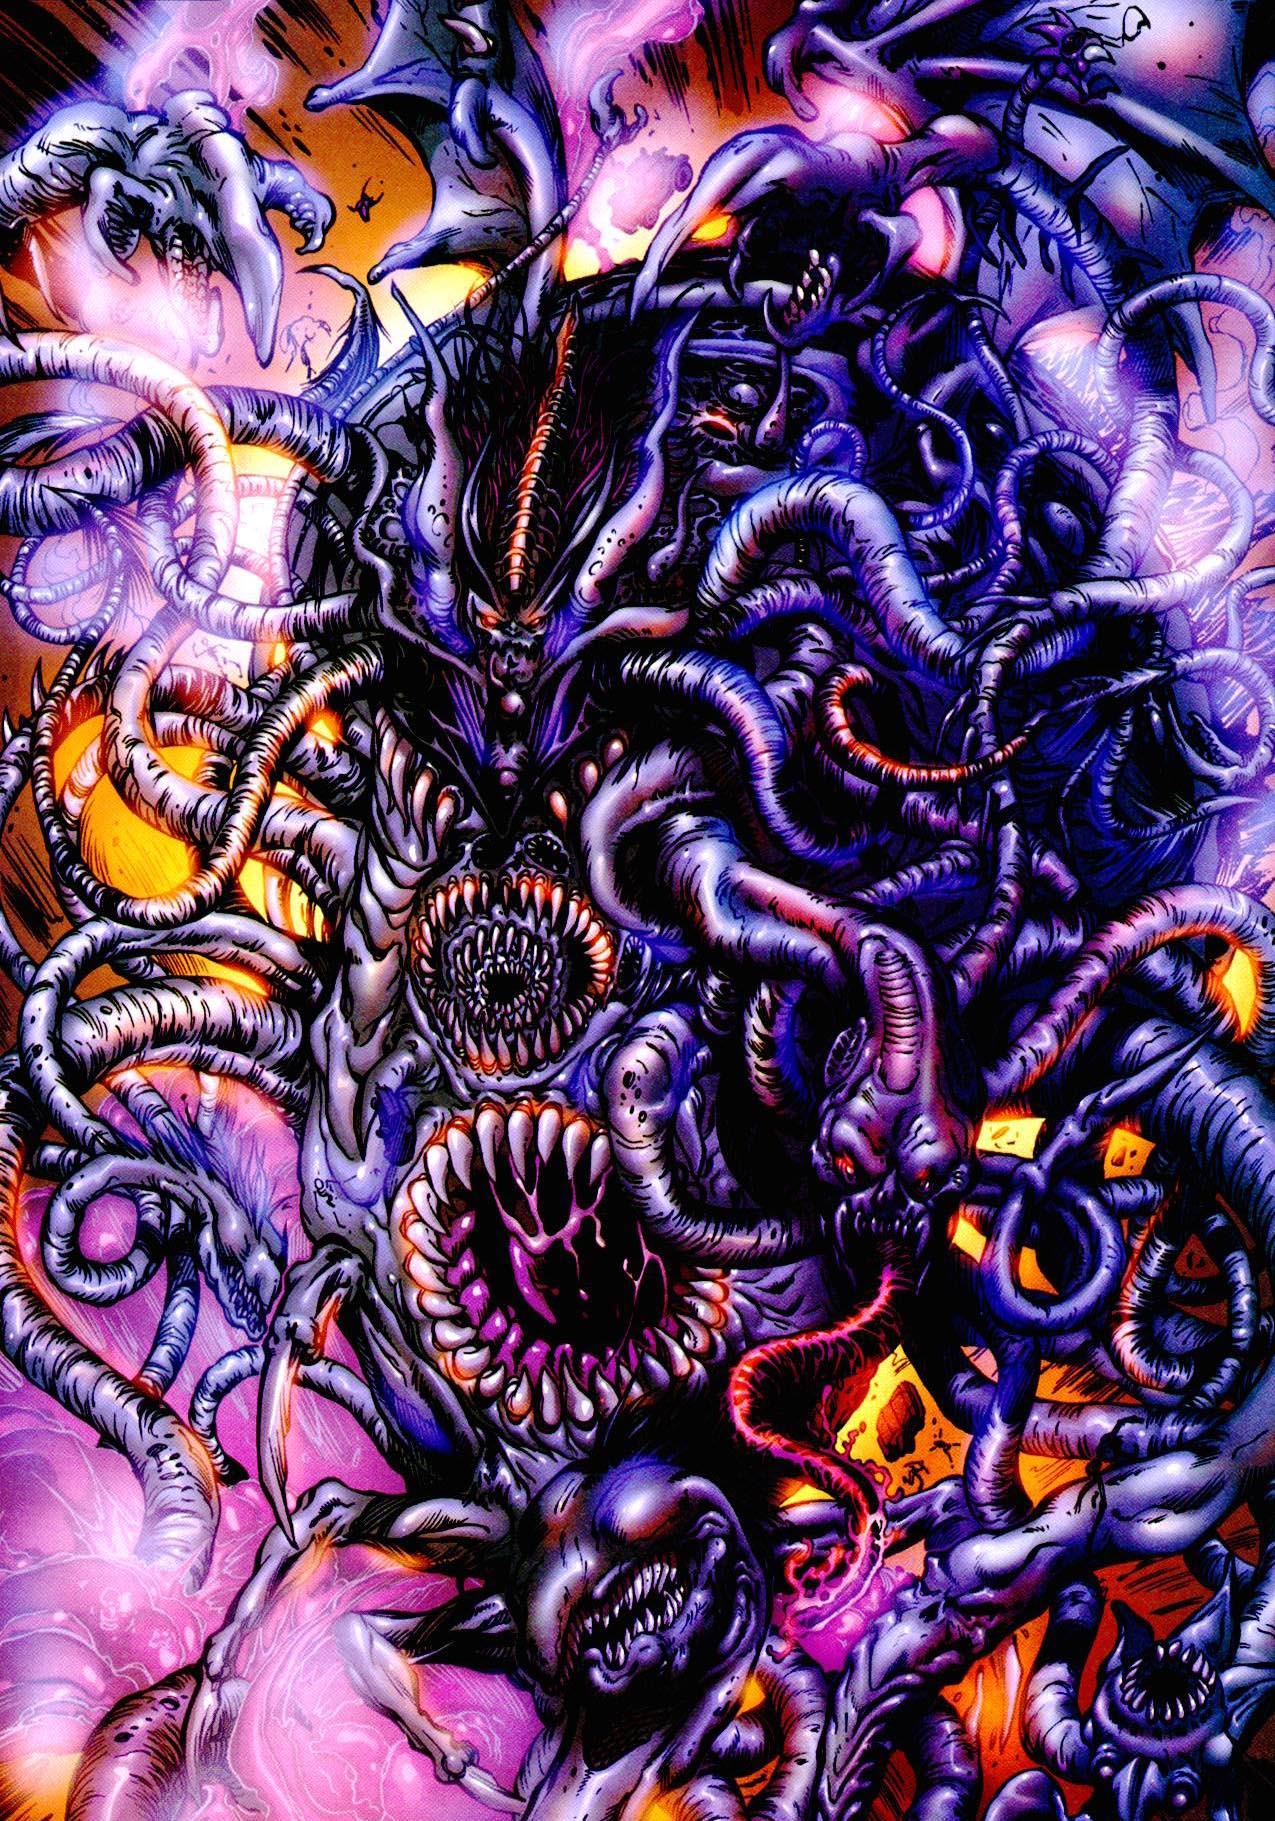 Armageddon (Chaos!)